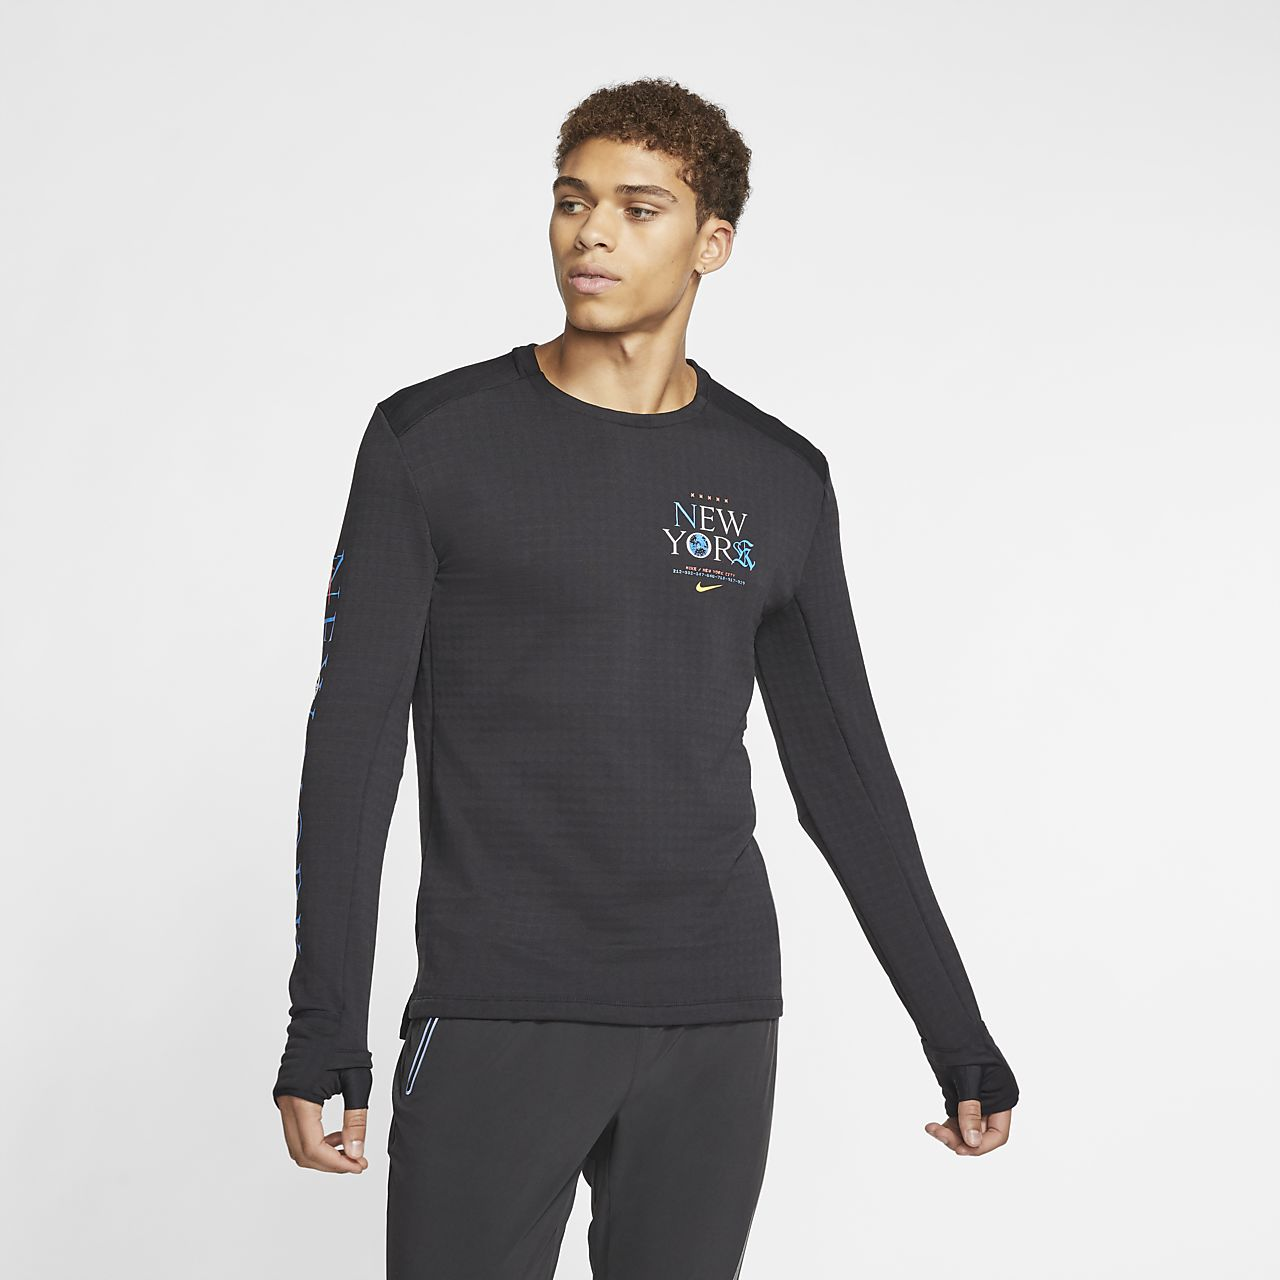 Nike Therma Sphere 3.0 NYC hosszú ujjú férfi futófelső